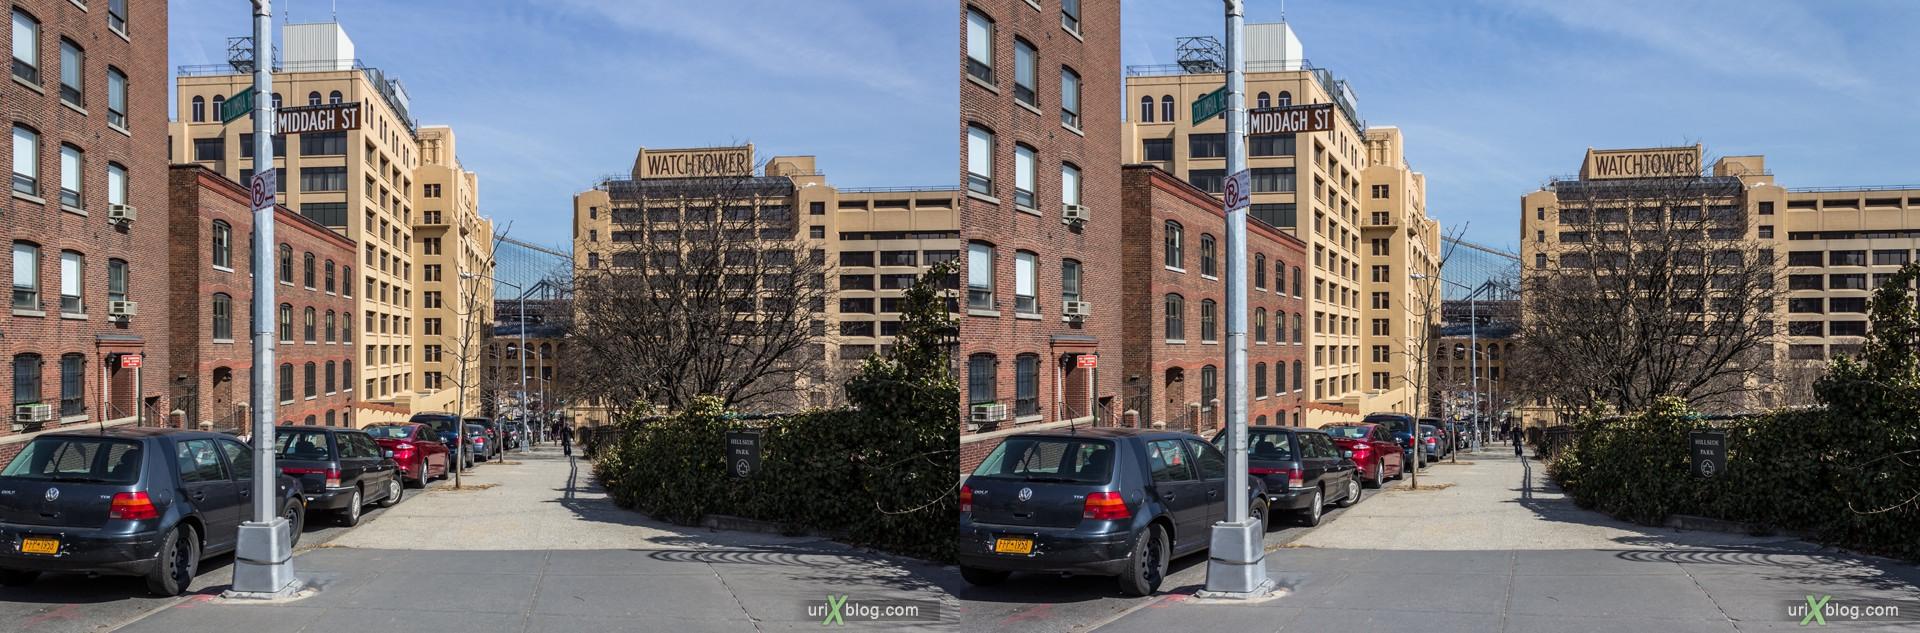 2013, Columbia Heights улица, Бруклин, Нью-Йорк, США, 3D, перекрёстные стереопары, стерео, стереопара, стереопары